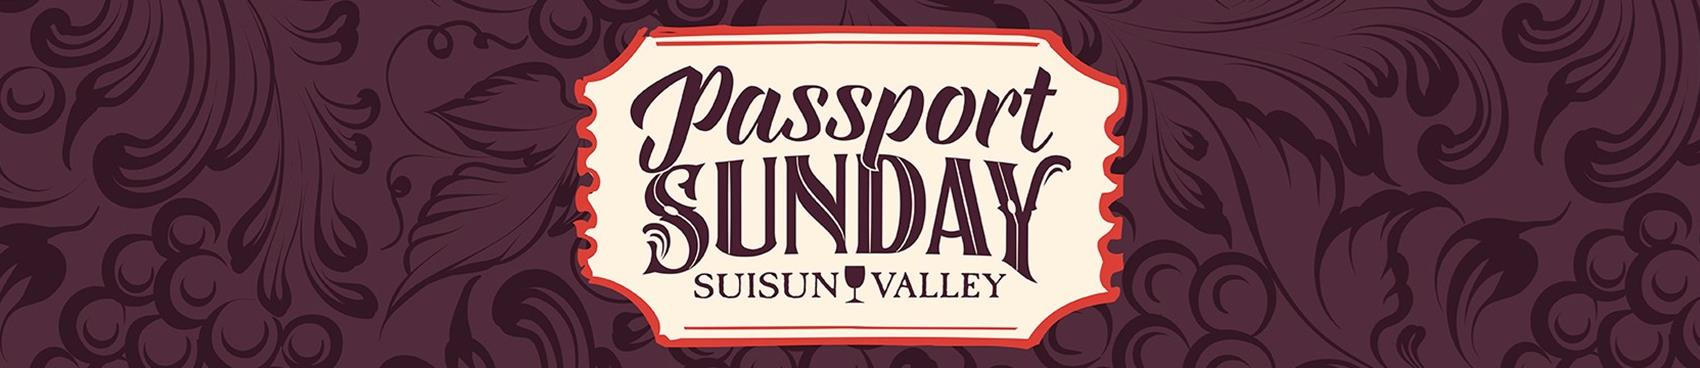 2021 Passport Sunday